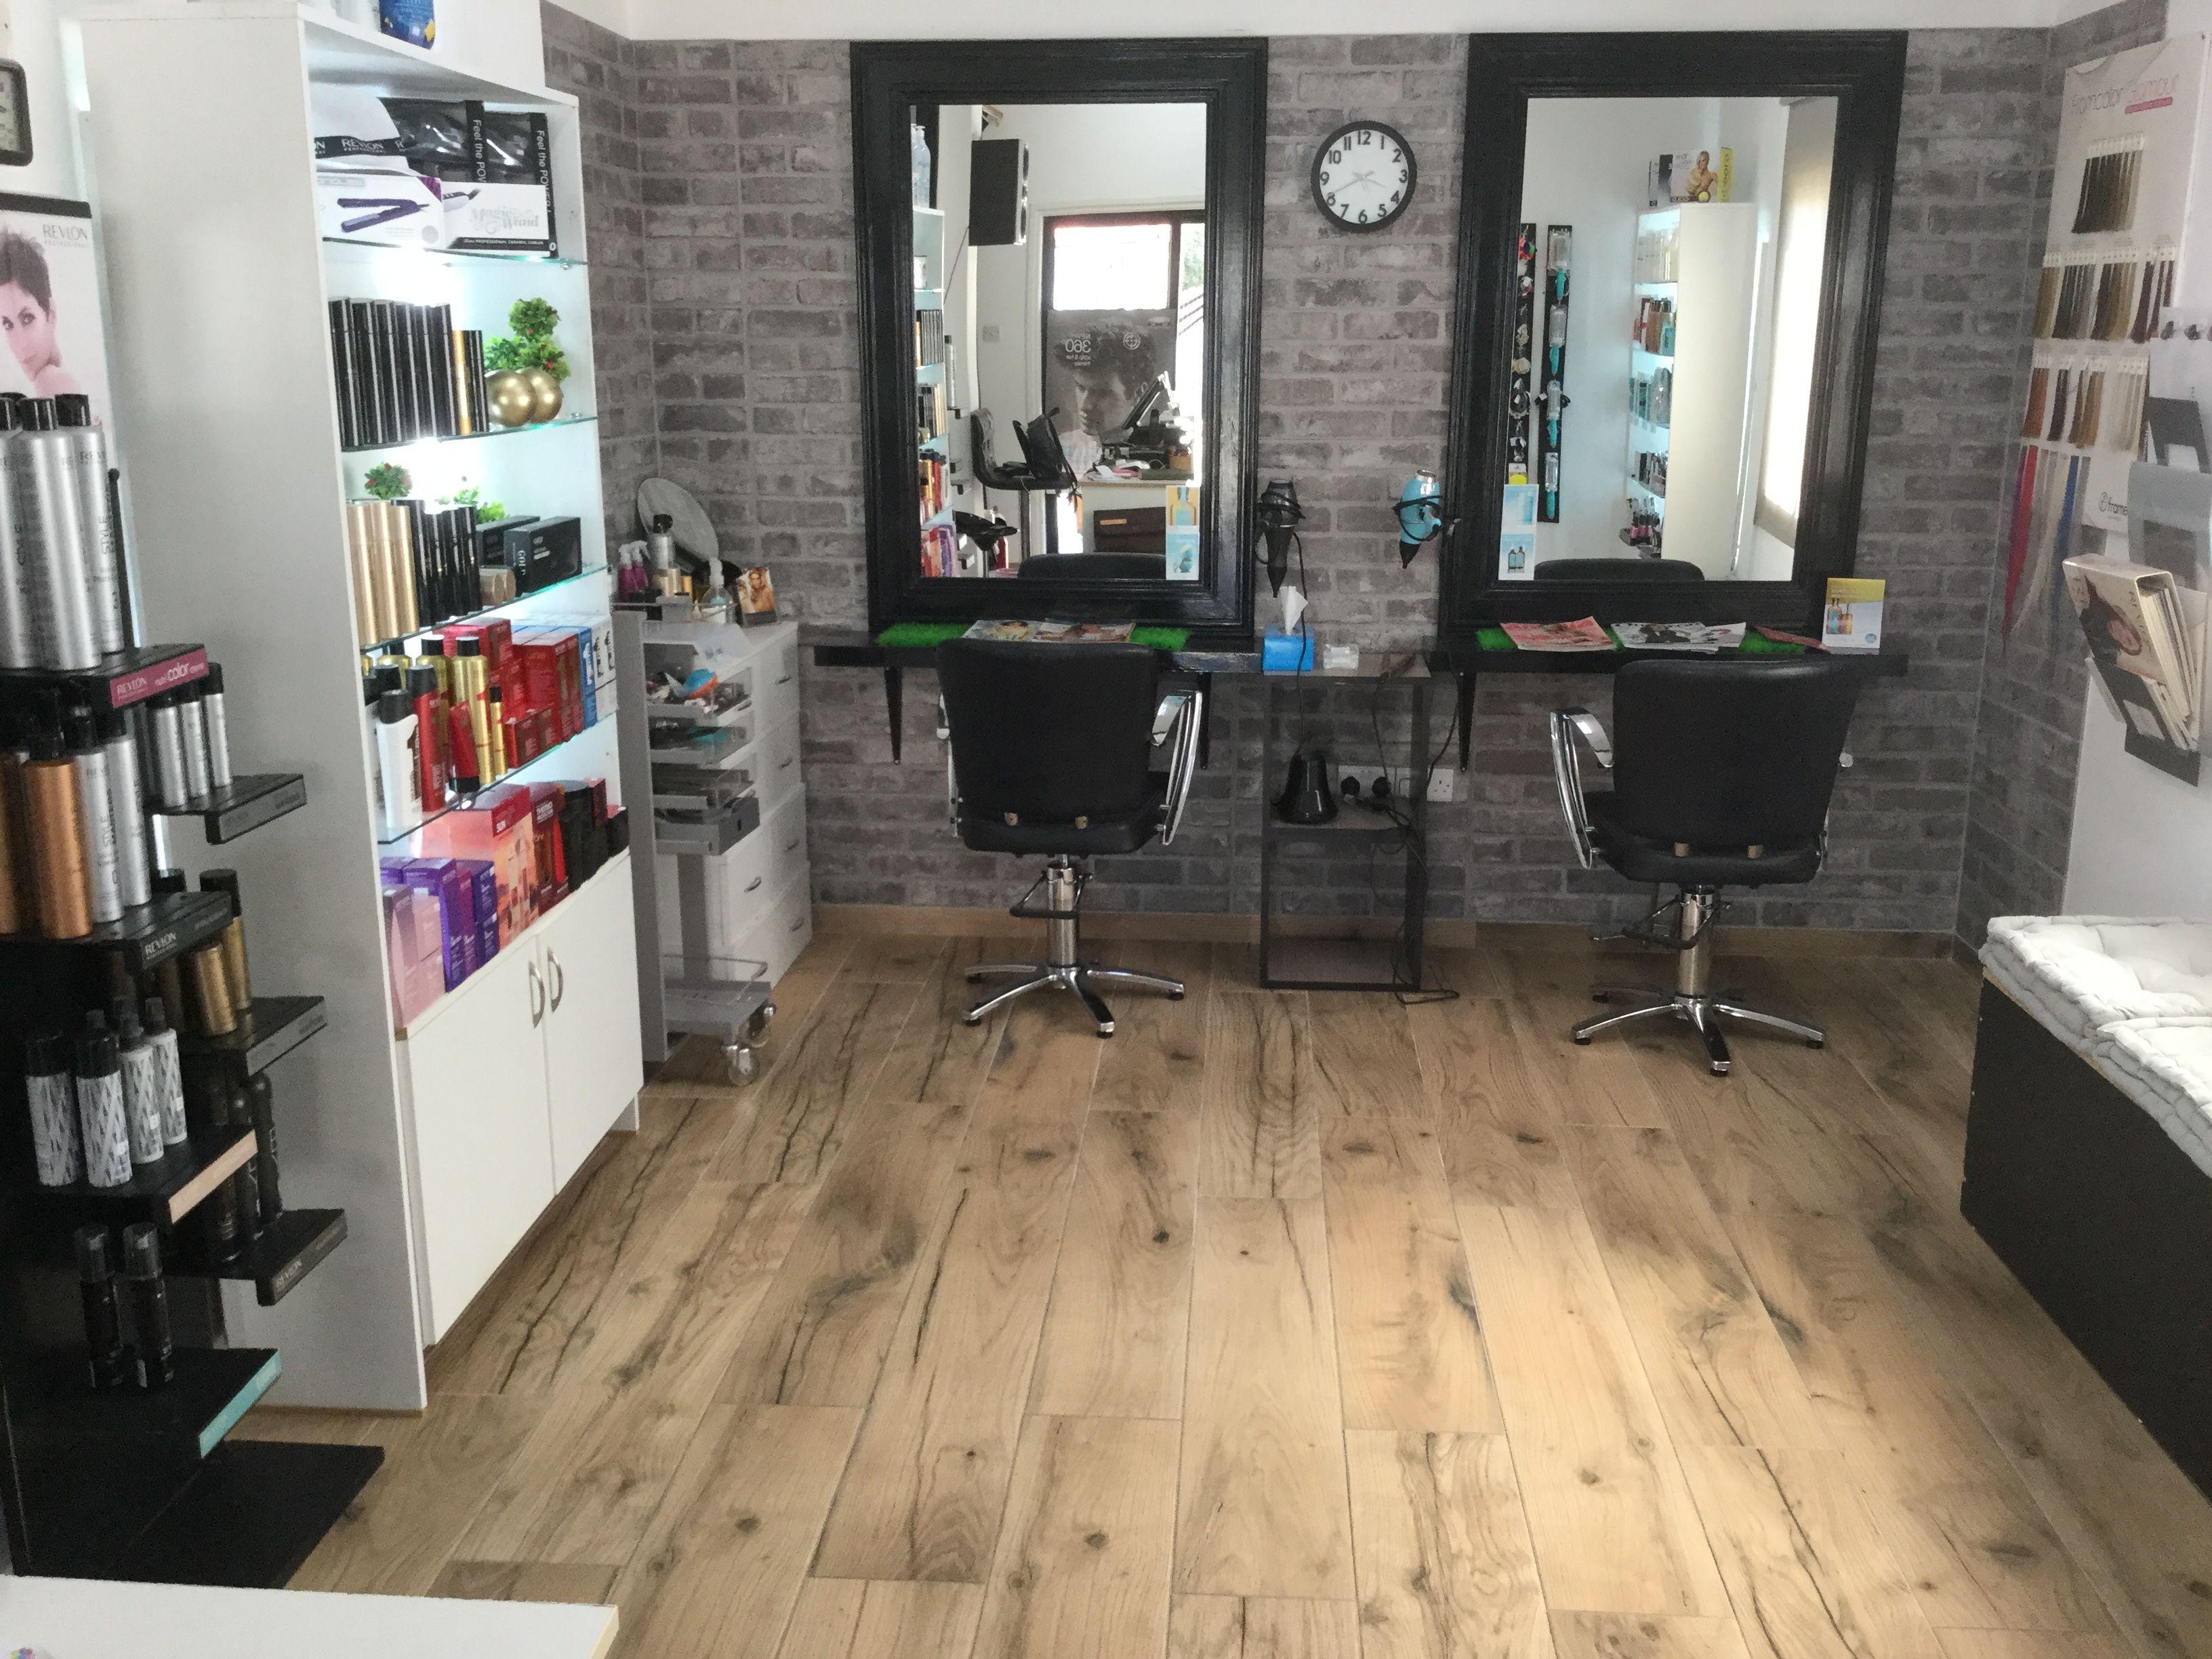 Hair Salon Ideas  Home hair salons, Rustic salon, Rustic salon decor